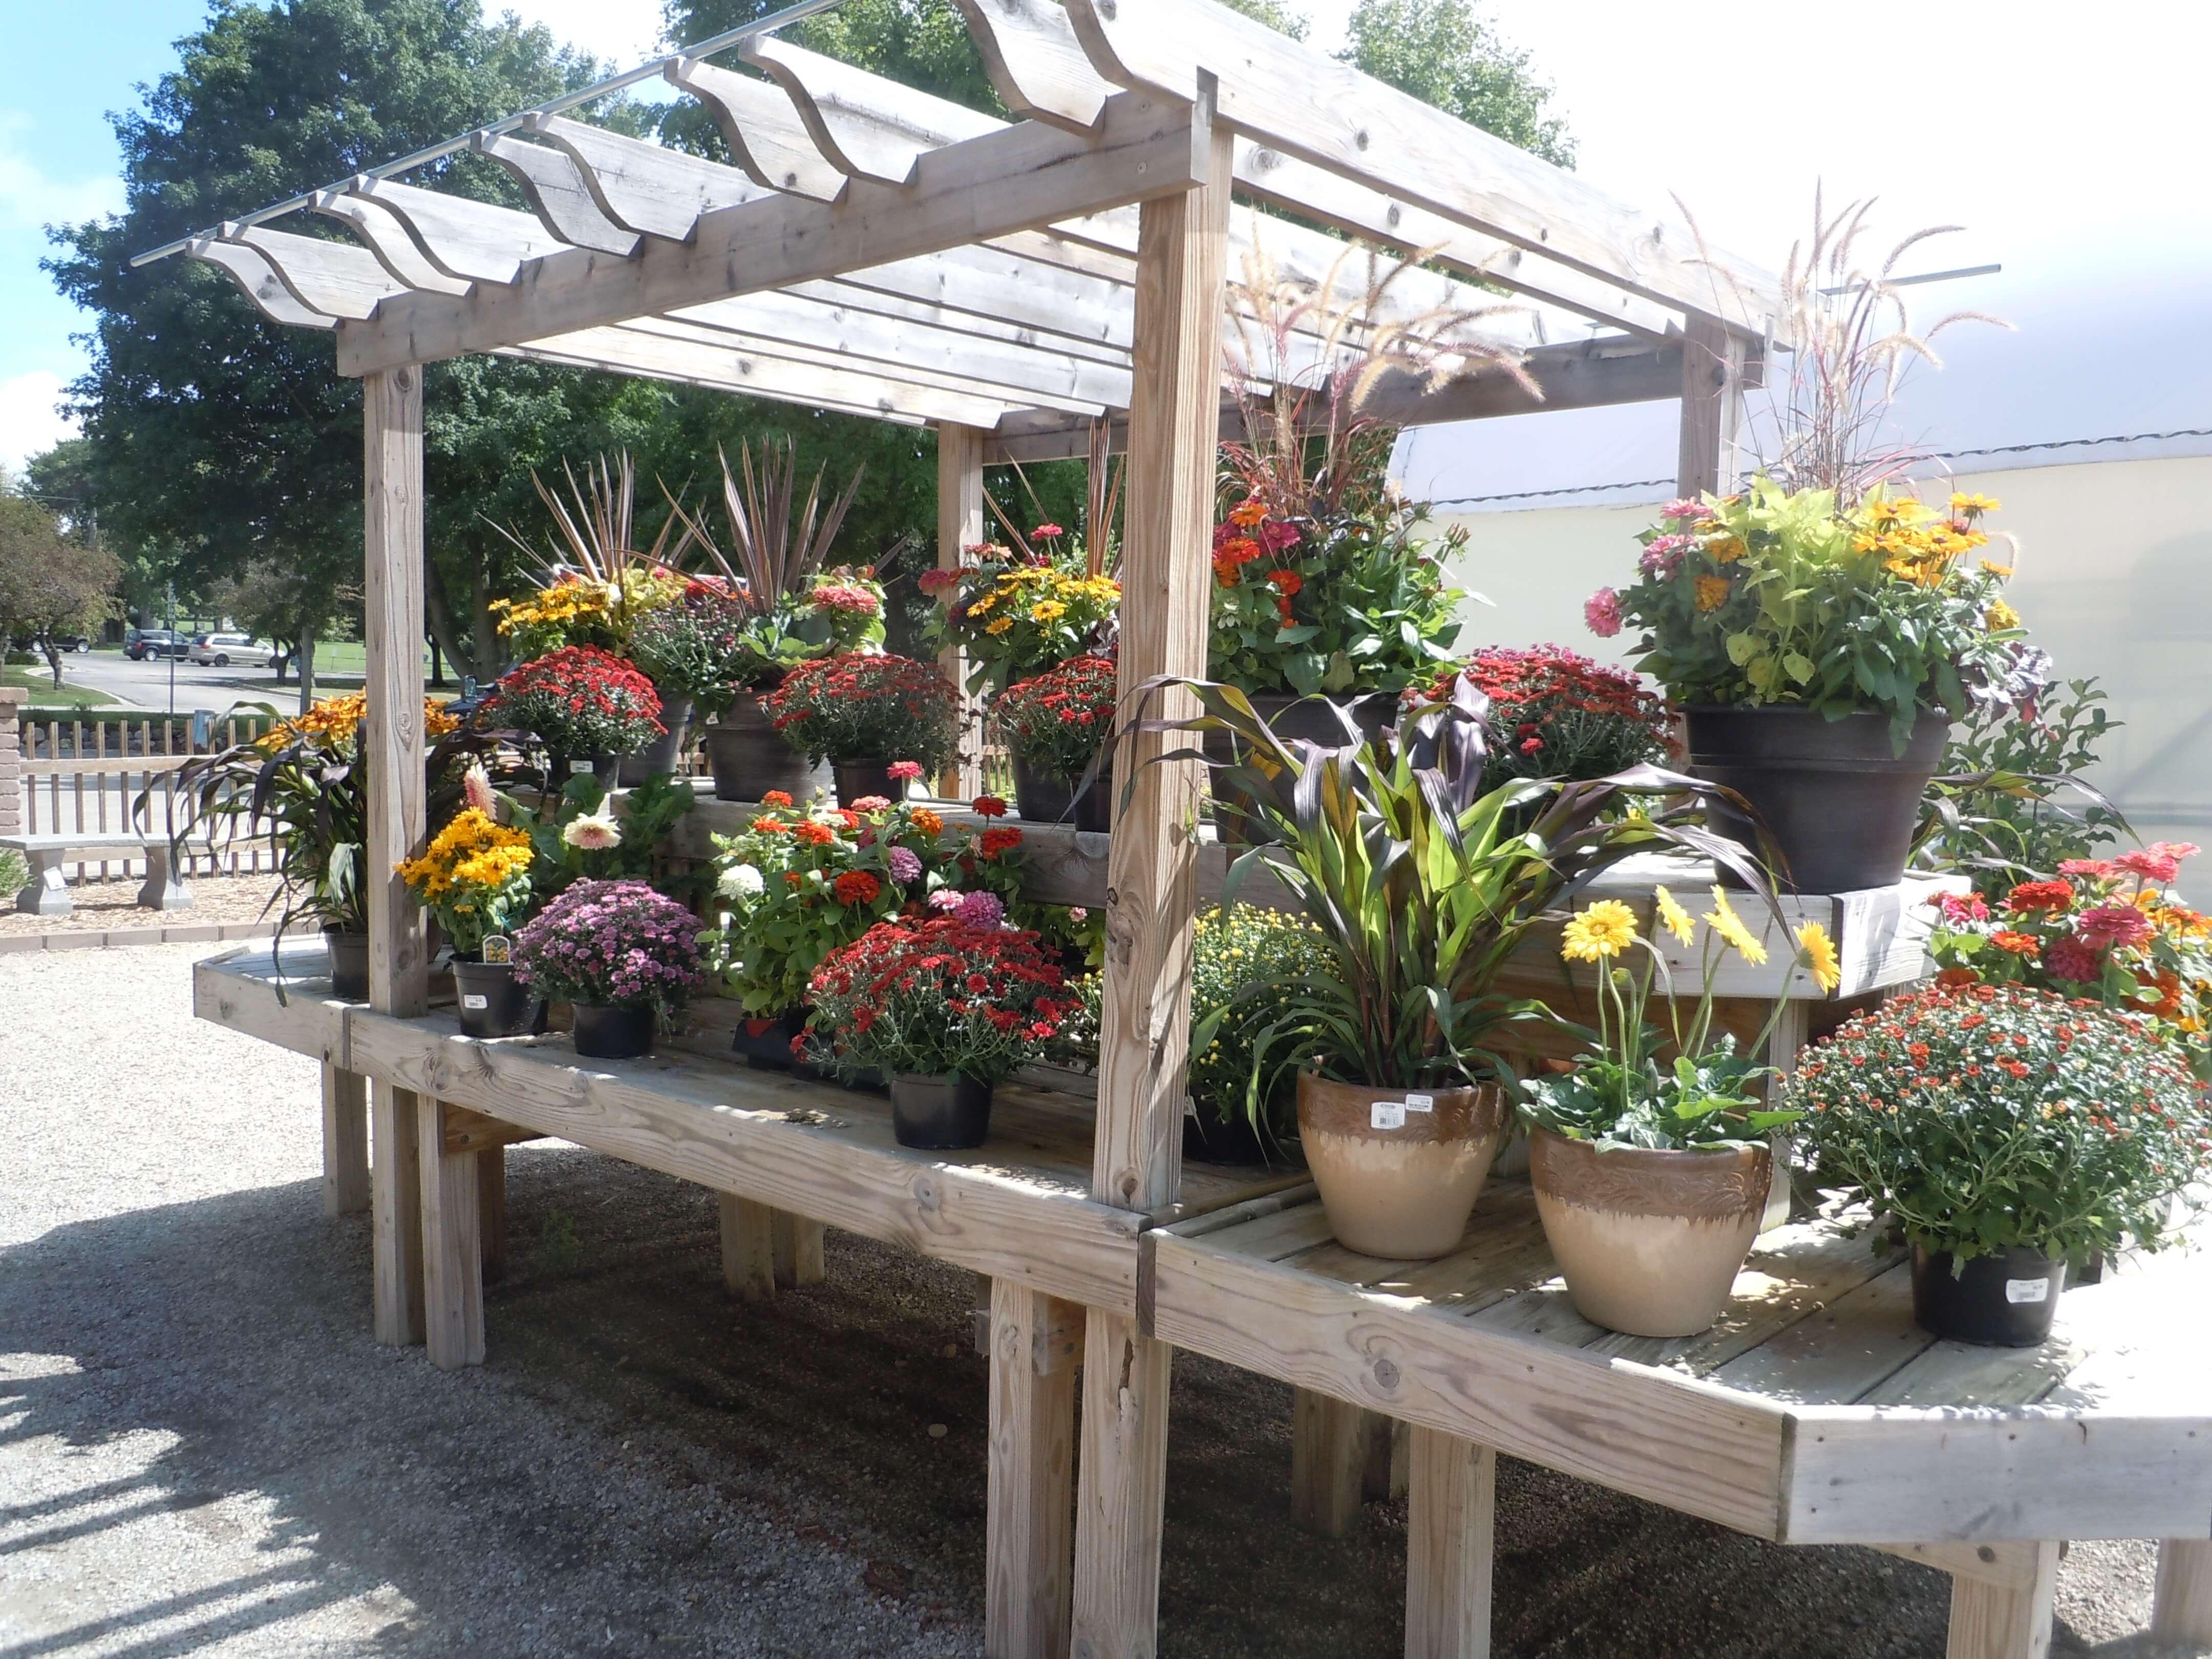 Blodgett Garden Center image 1